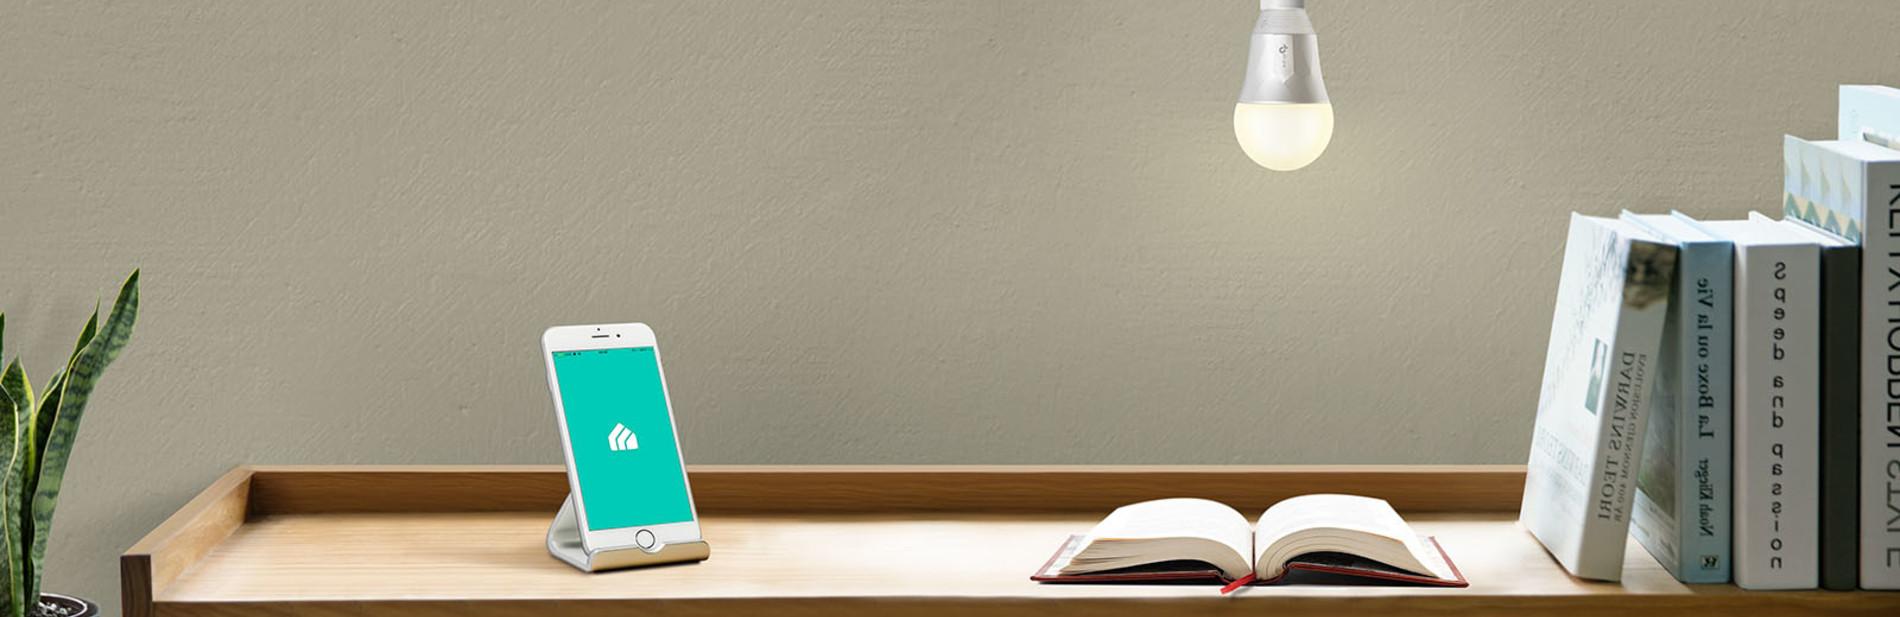 Kasa Smart Wi-Fi LED Light Bulb, White | Kasa Smart